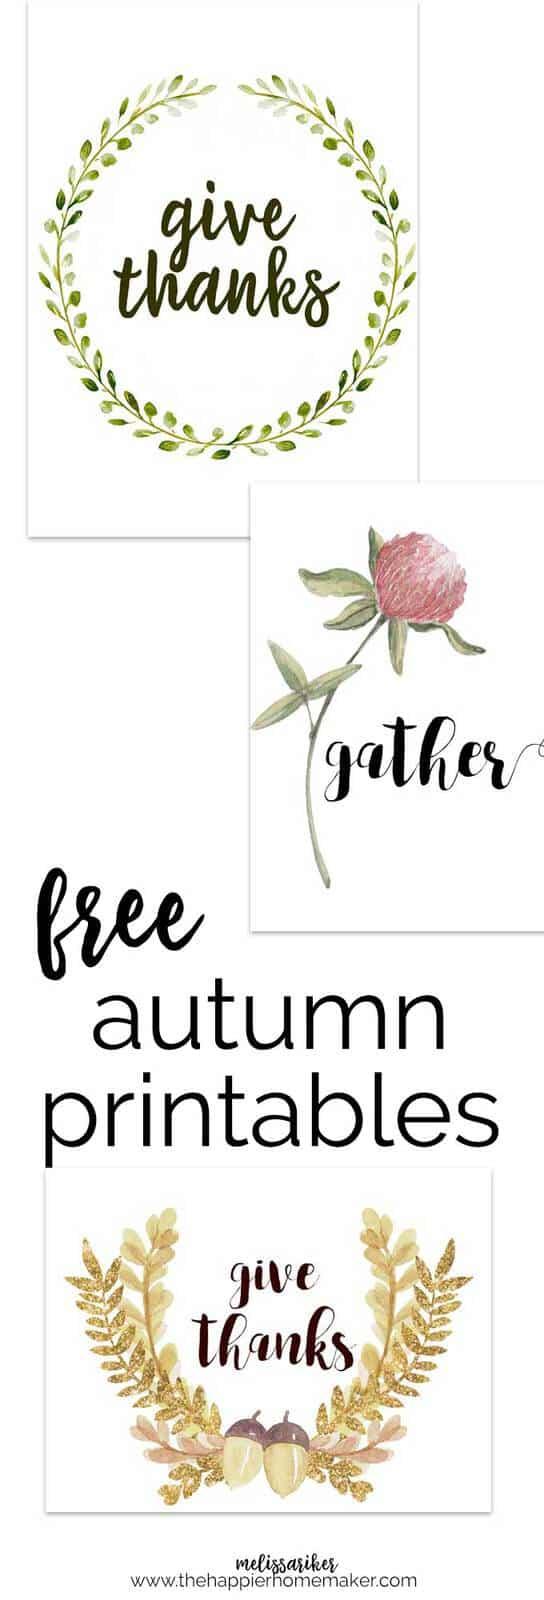 collage of free autumn printables